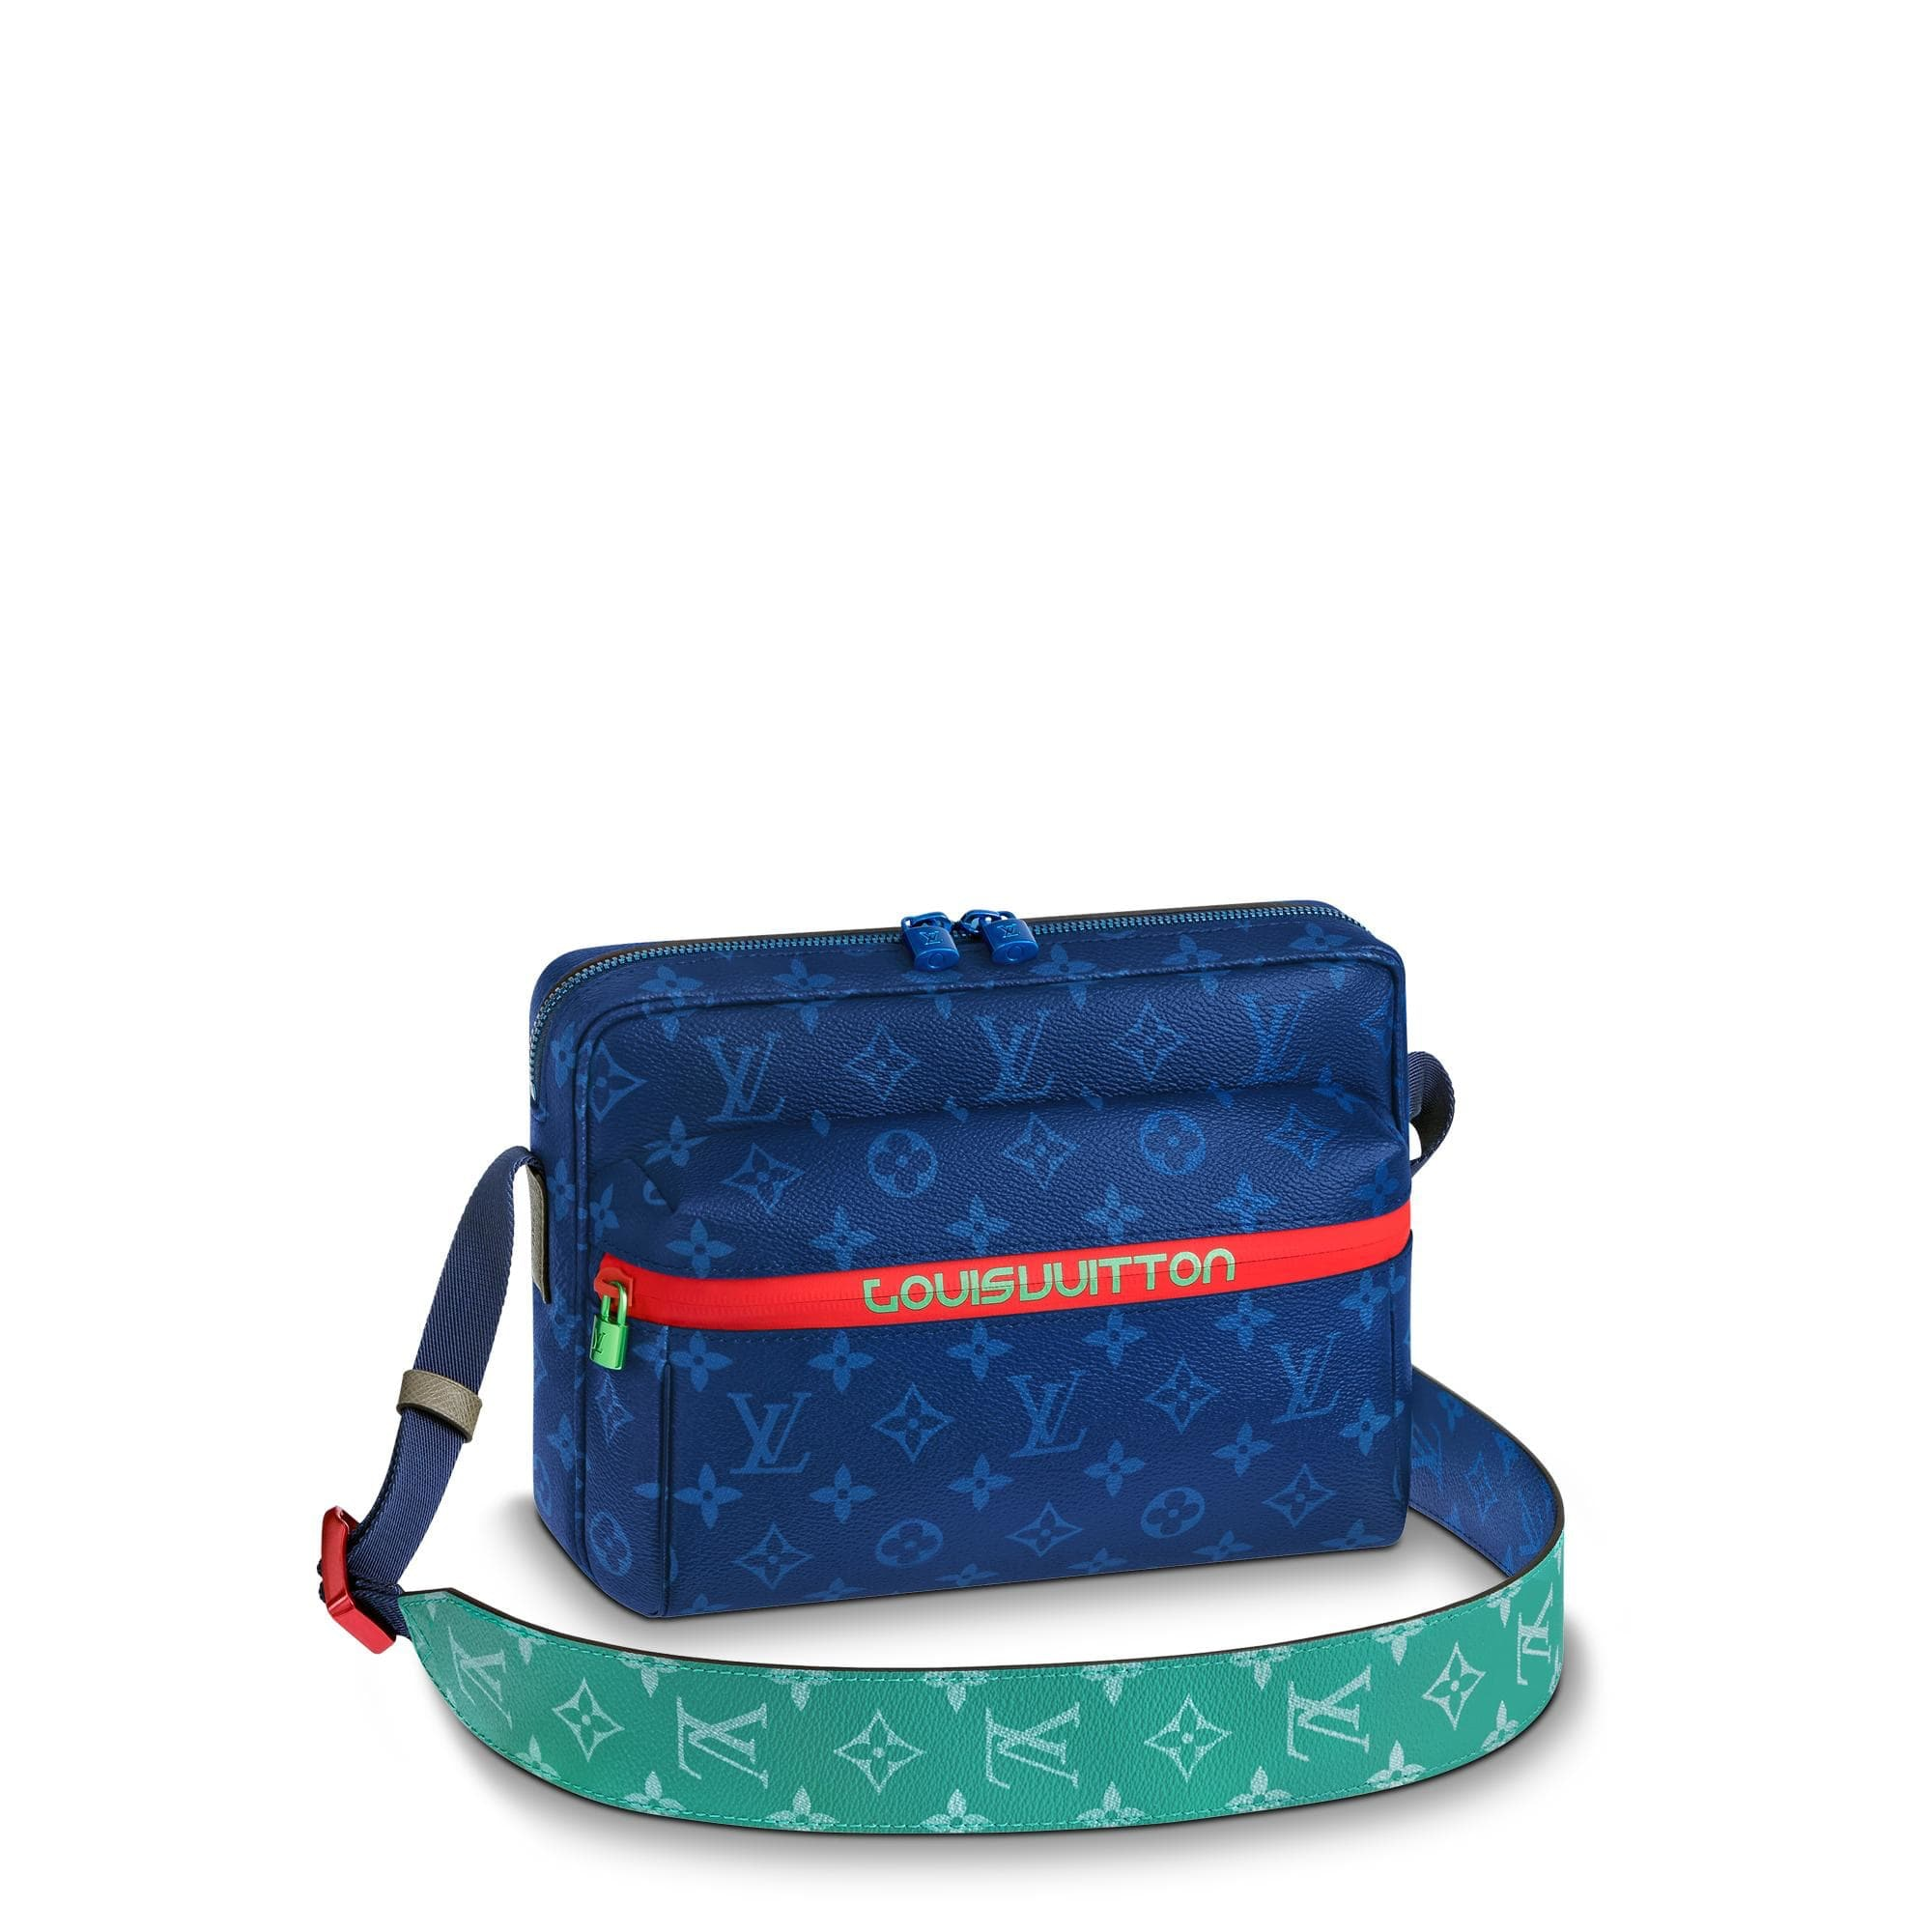 Louis Vuitton Messenger Outdoor Monogram PM Pacific